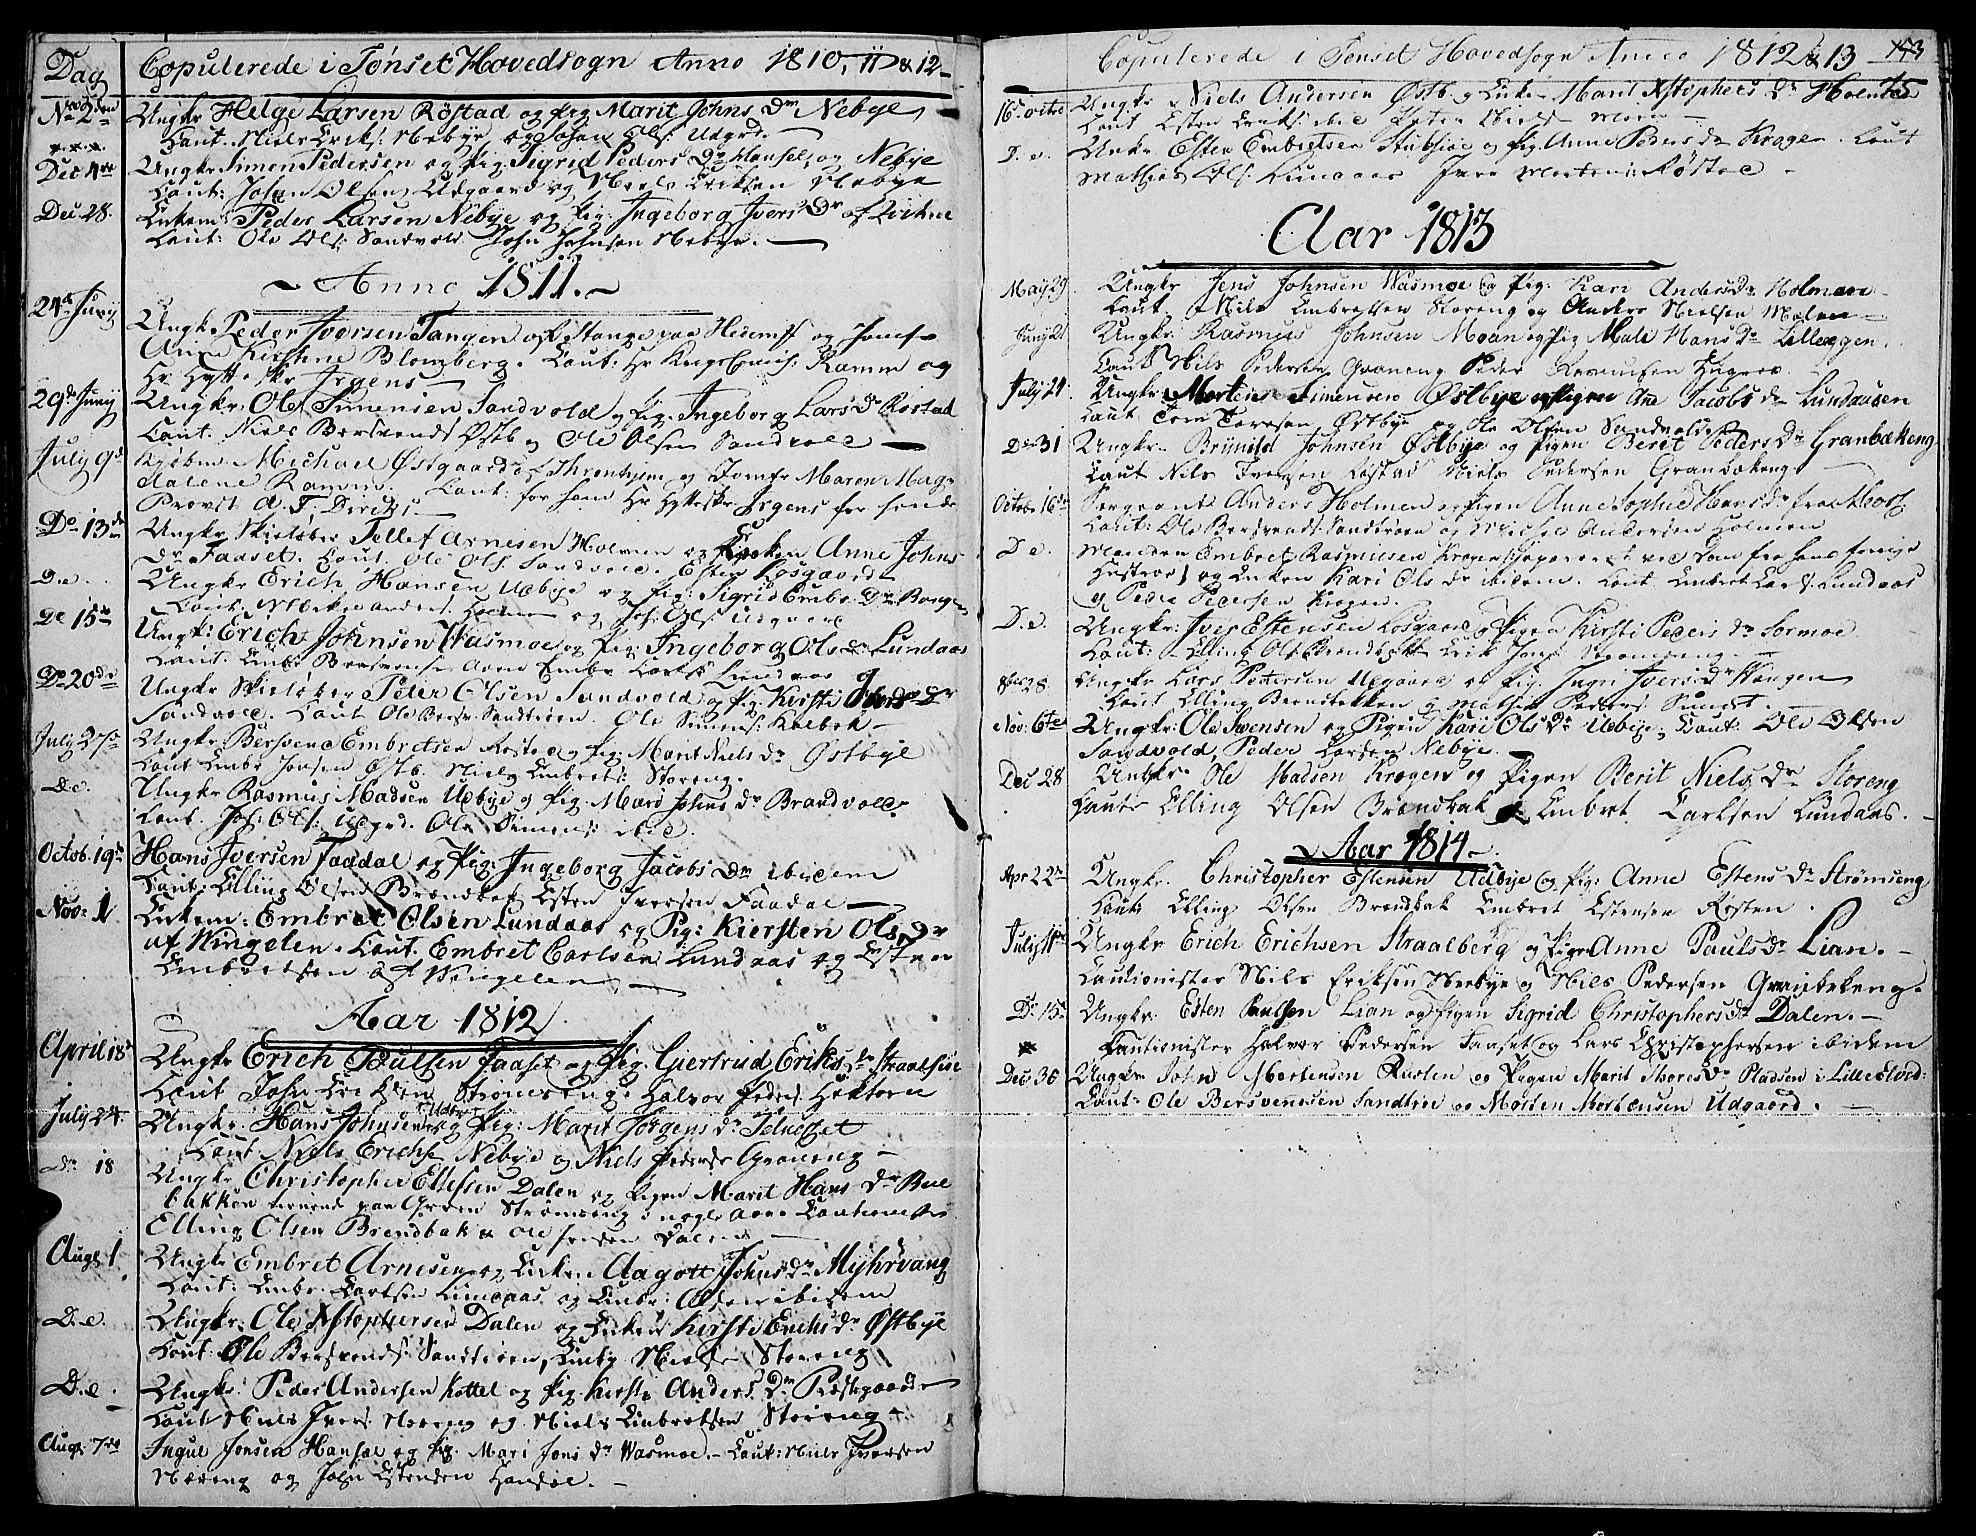 SAH, Tynset prestekontor, Ministerialbok nr. 15, 1801-1814, s. 75